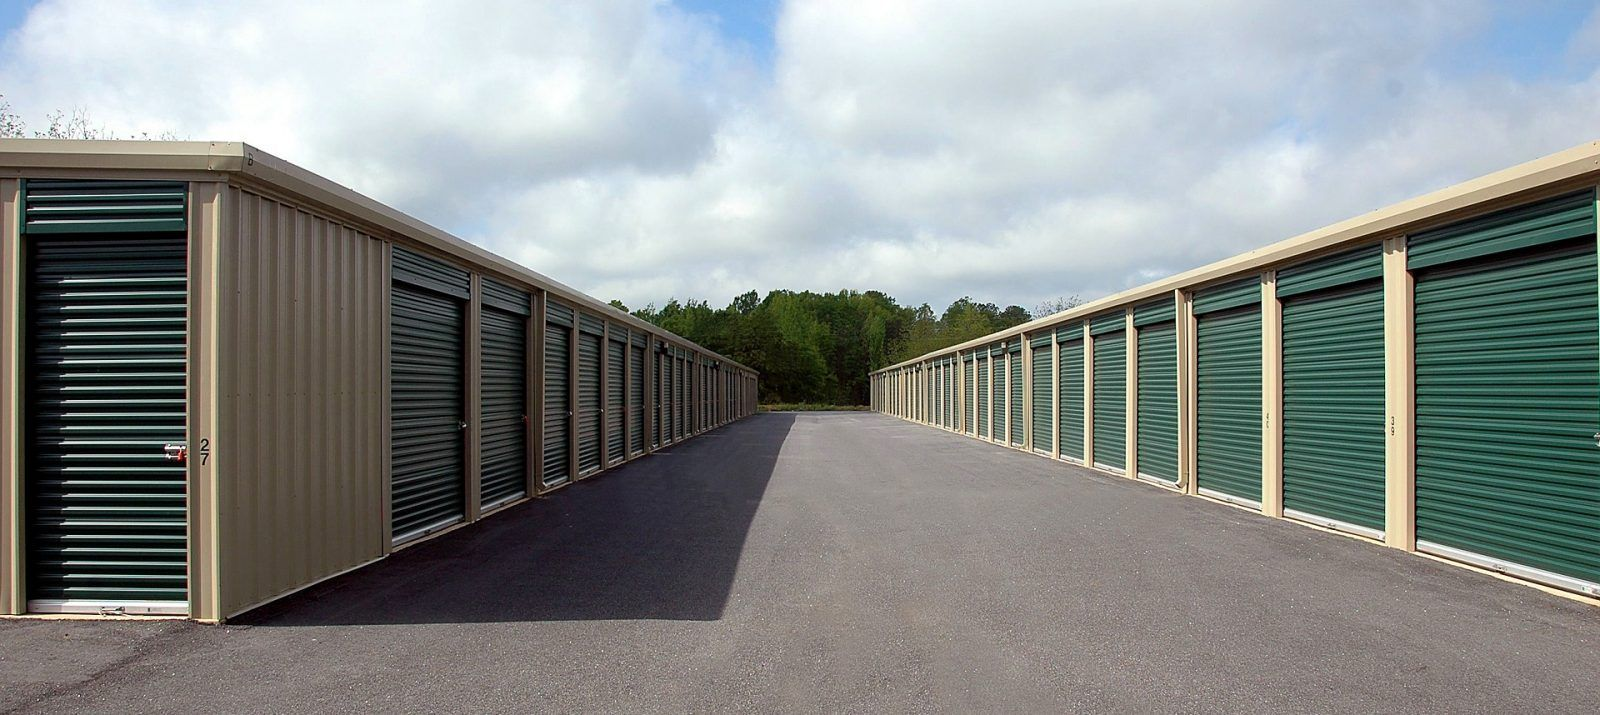 Moving And Storage Business In Dc Company Storage Self Storage Storage Unit